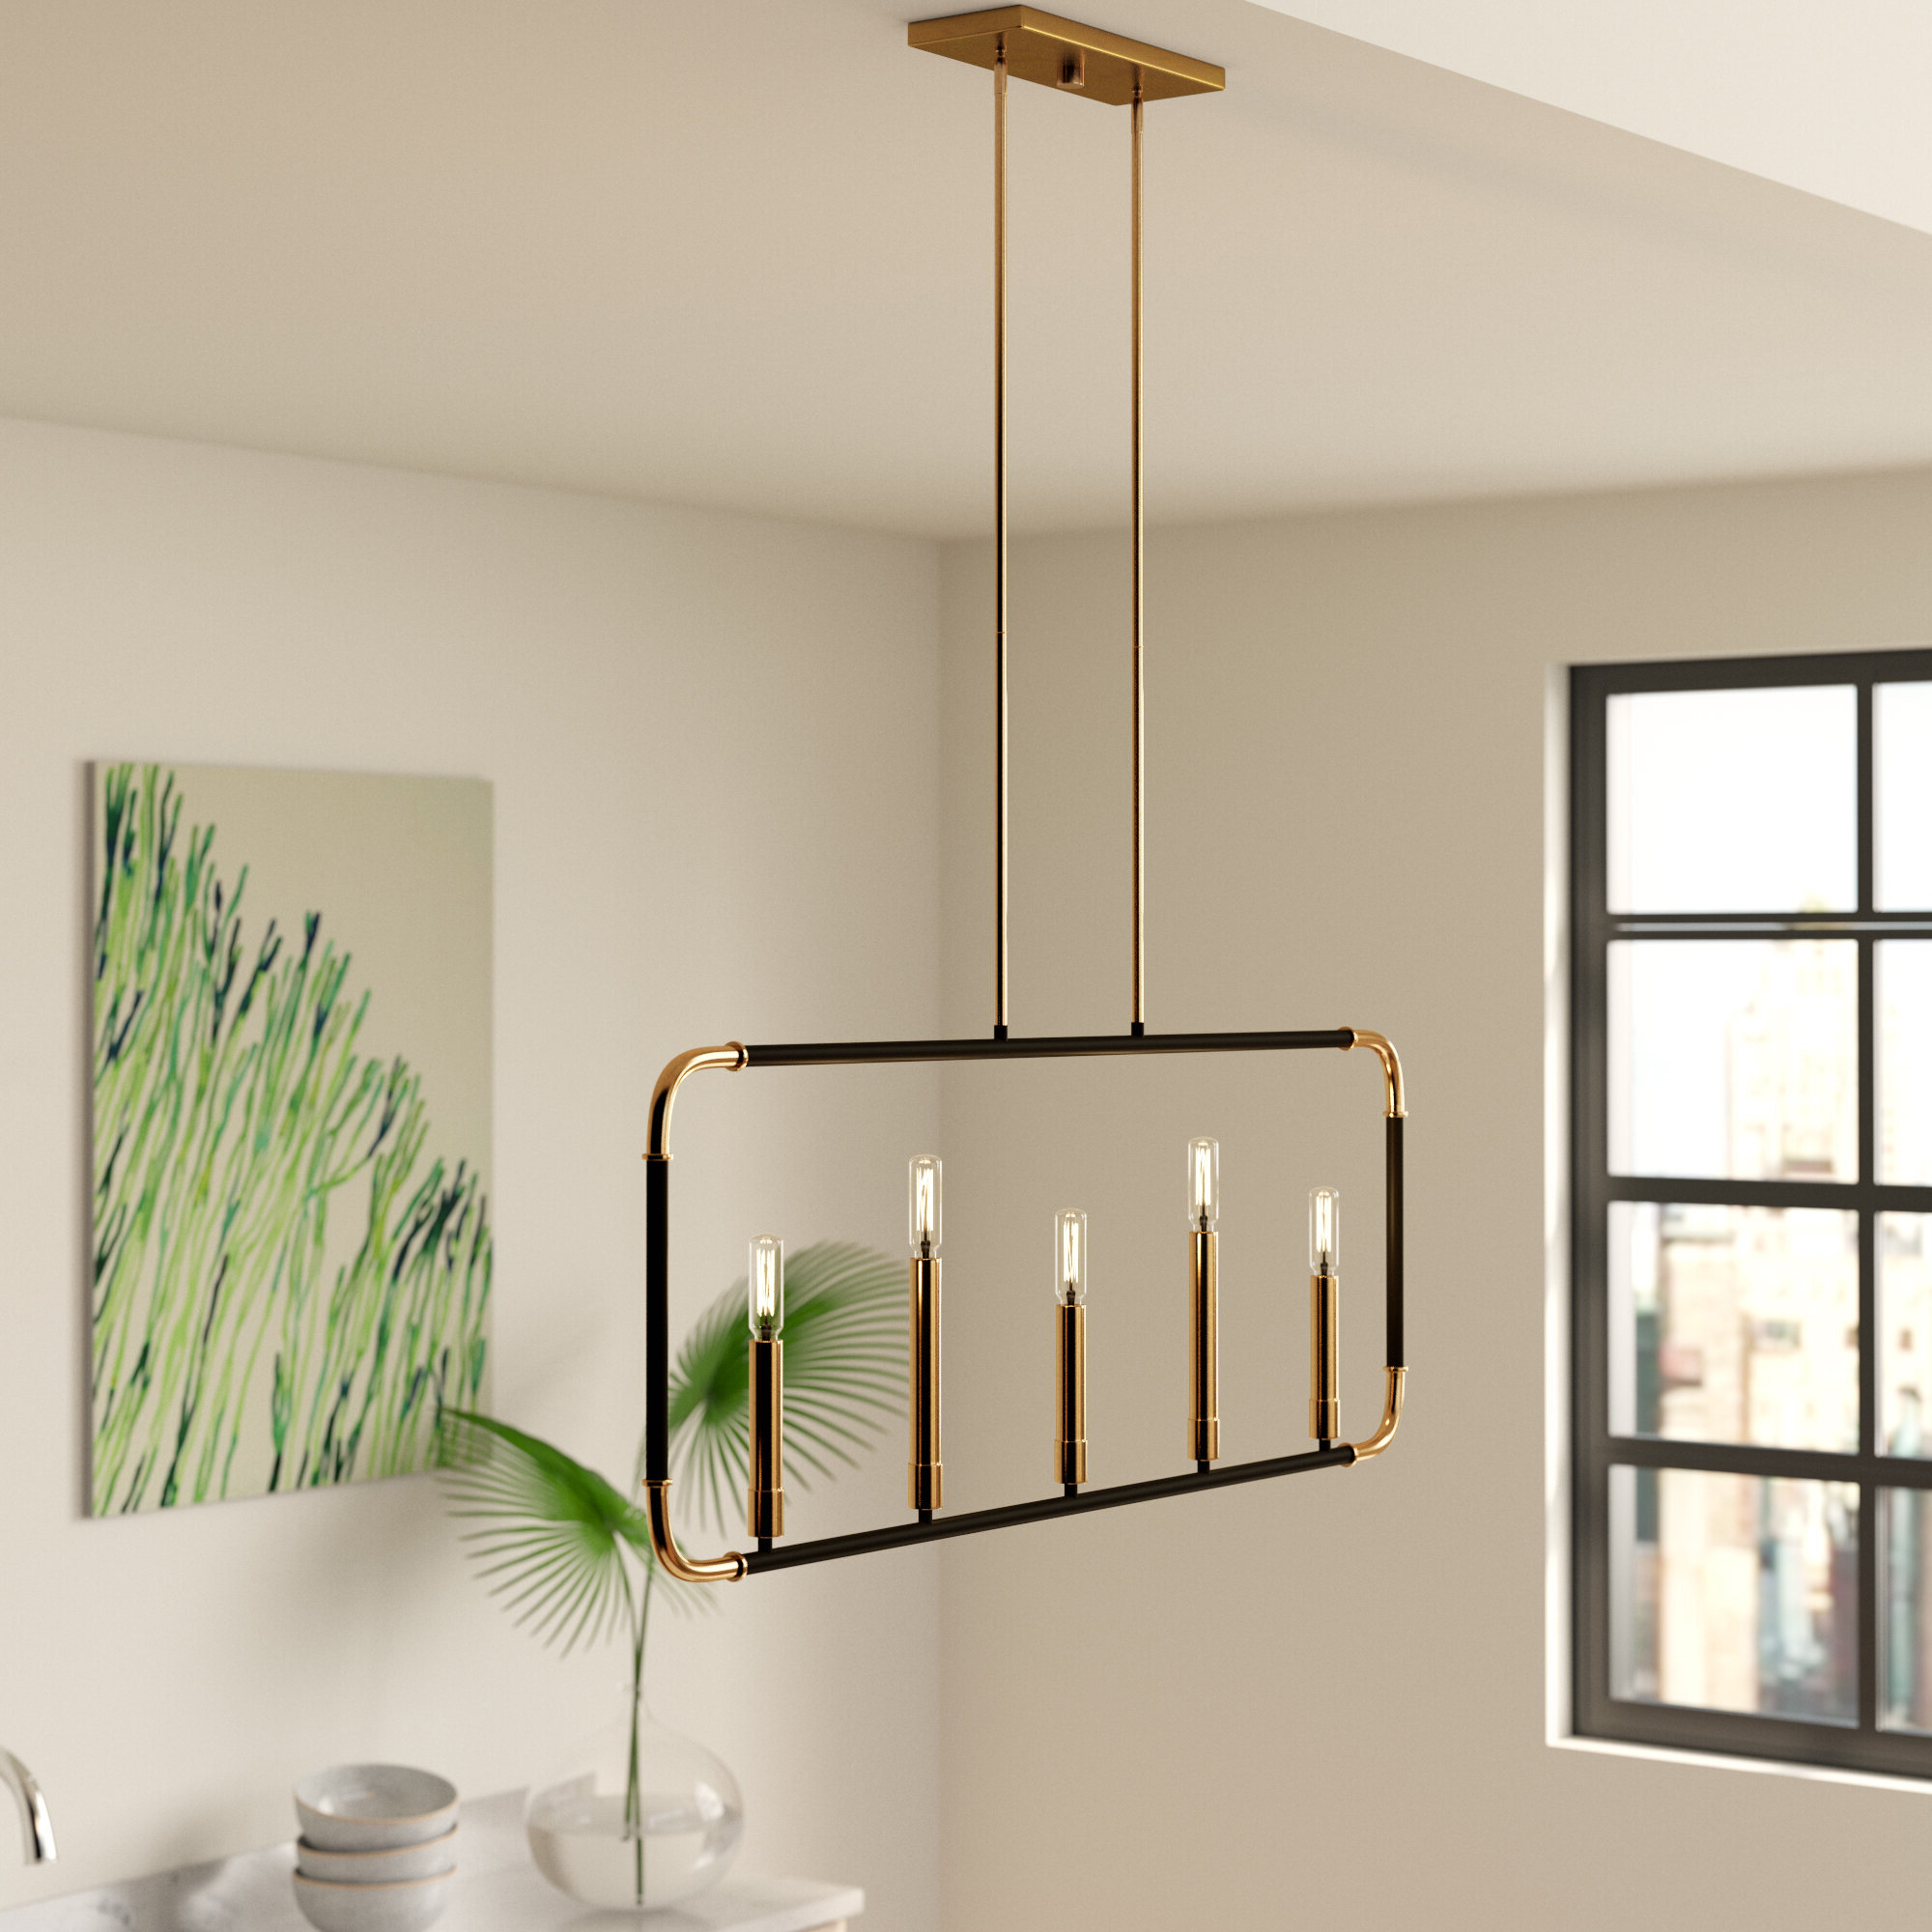 Preferred Freemont 5 Light Kitchen Island Linear Chandeliers Pertaining To Jairo 5 Light Kitchen Island Pendant (Gallery 10 of 20)